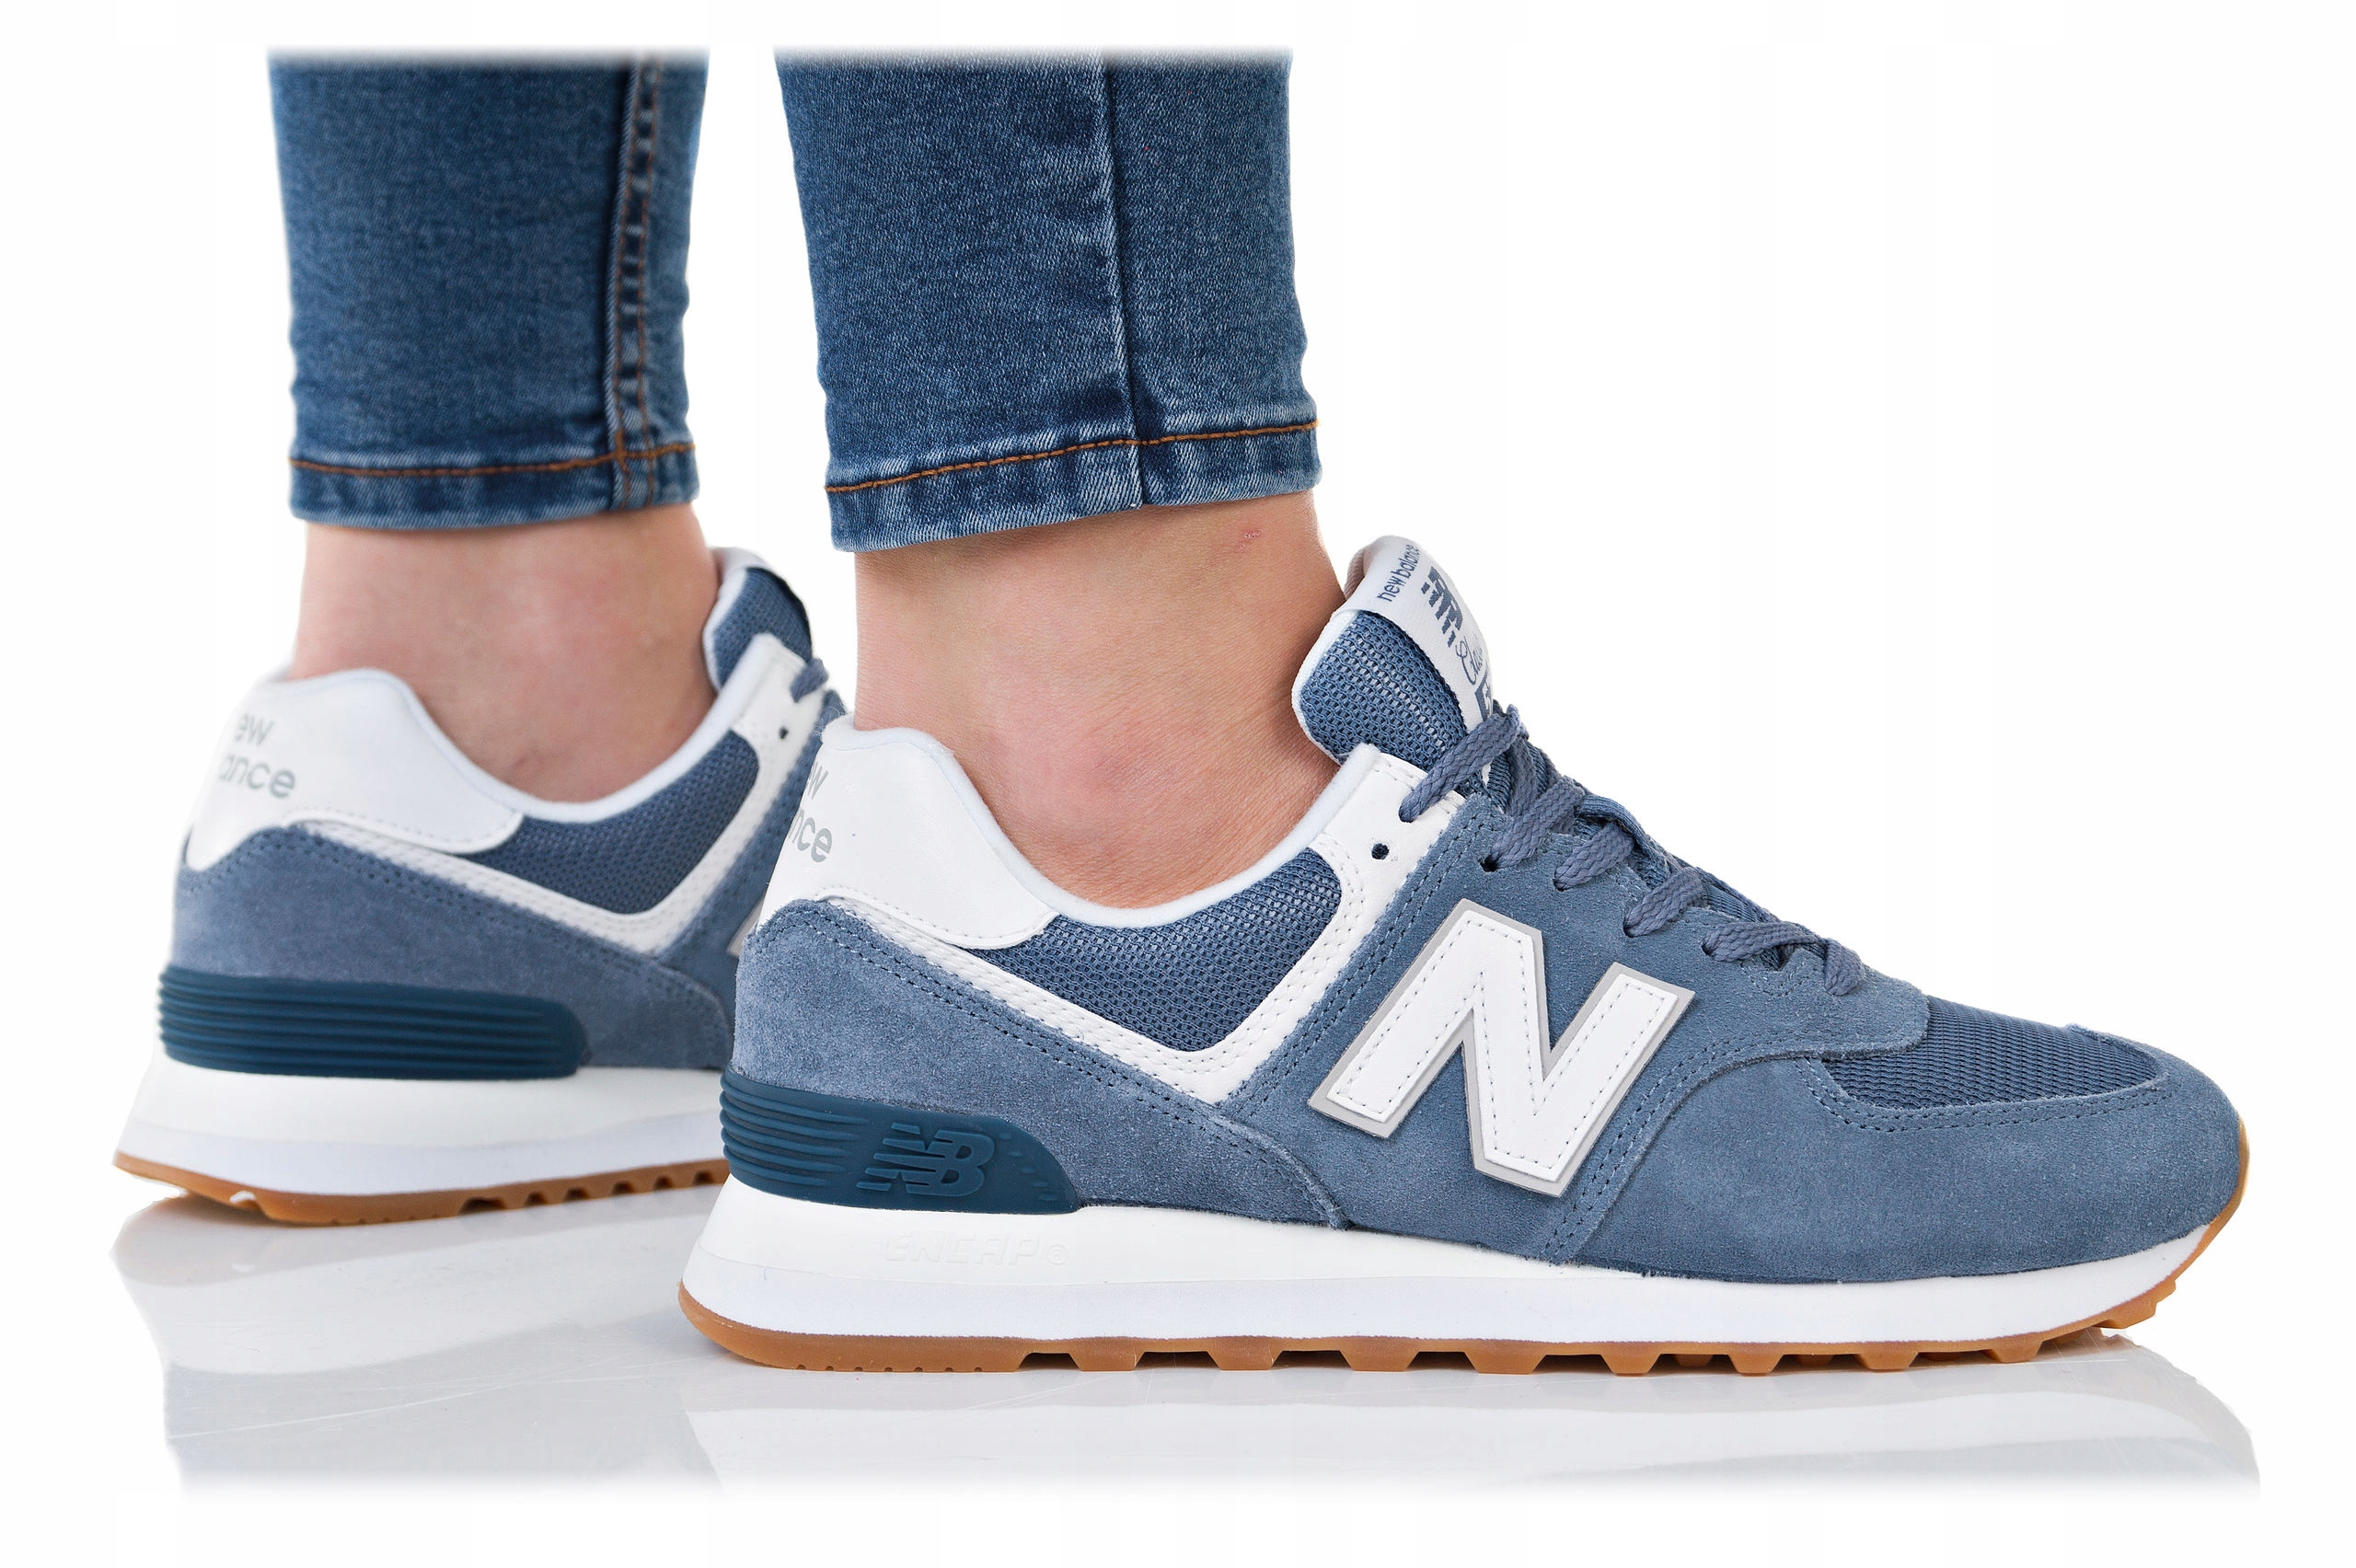 Granatowe buty damskie new balance 574 New Balance, kolekcja